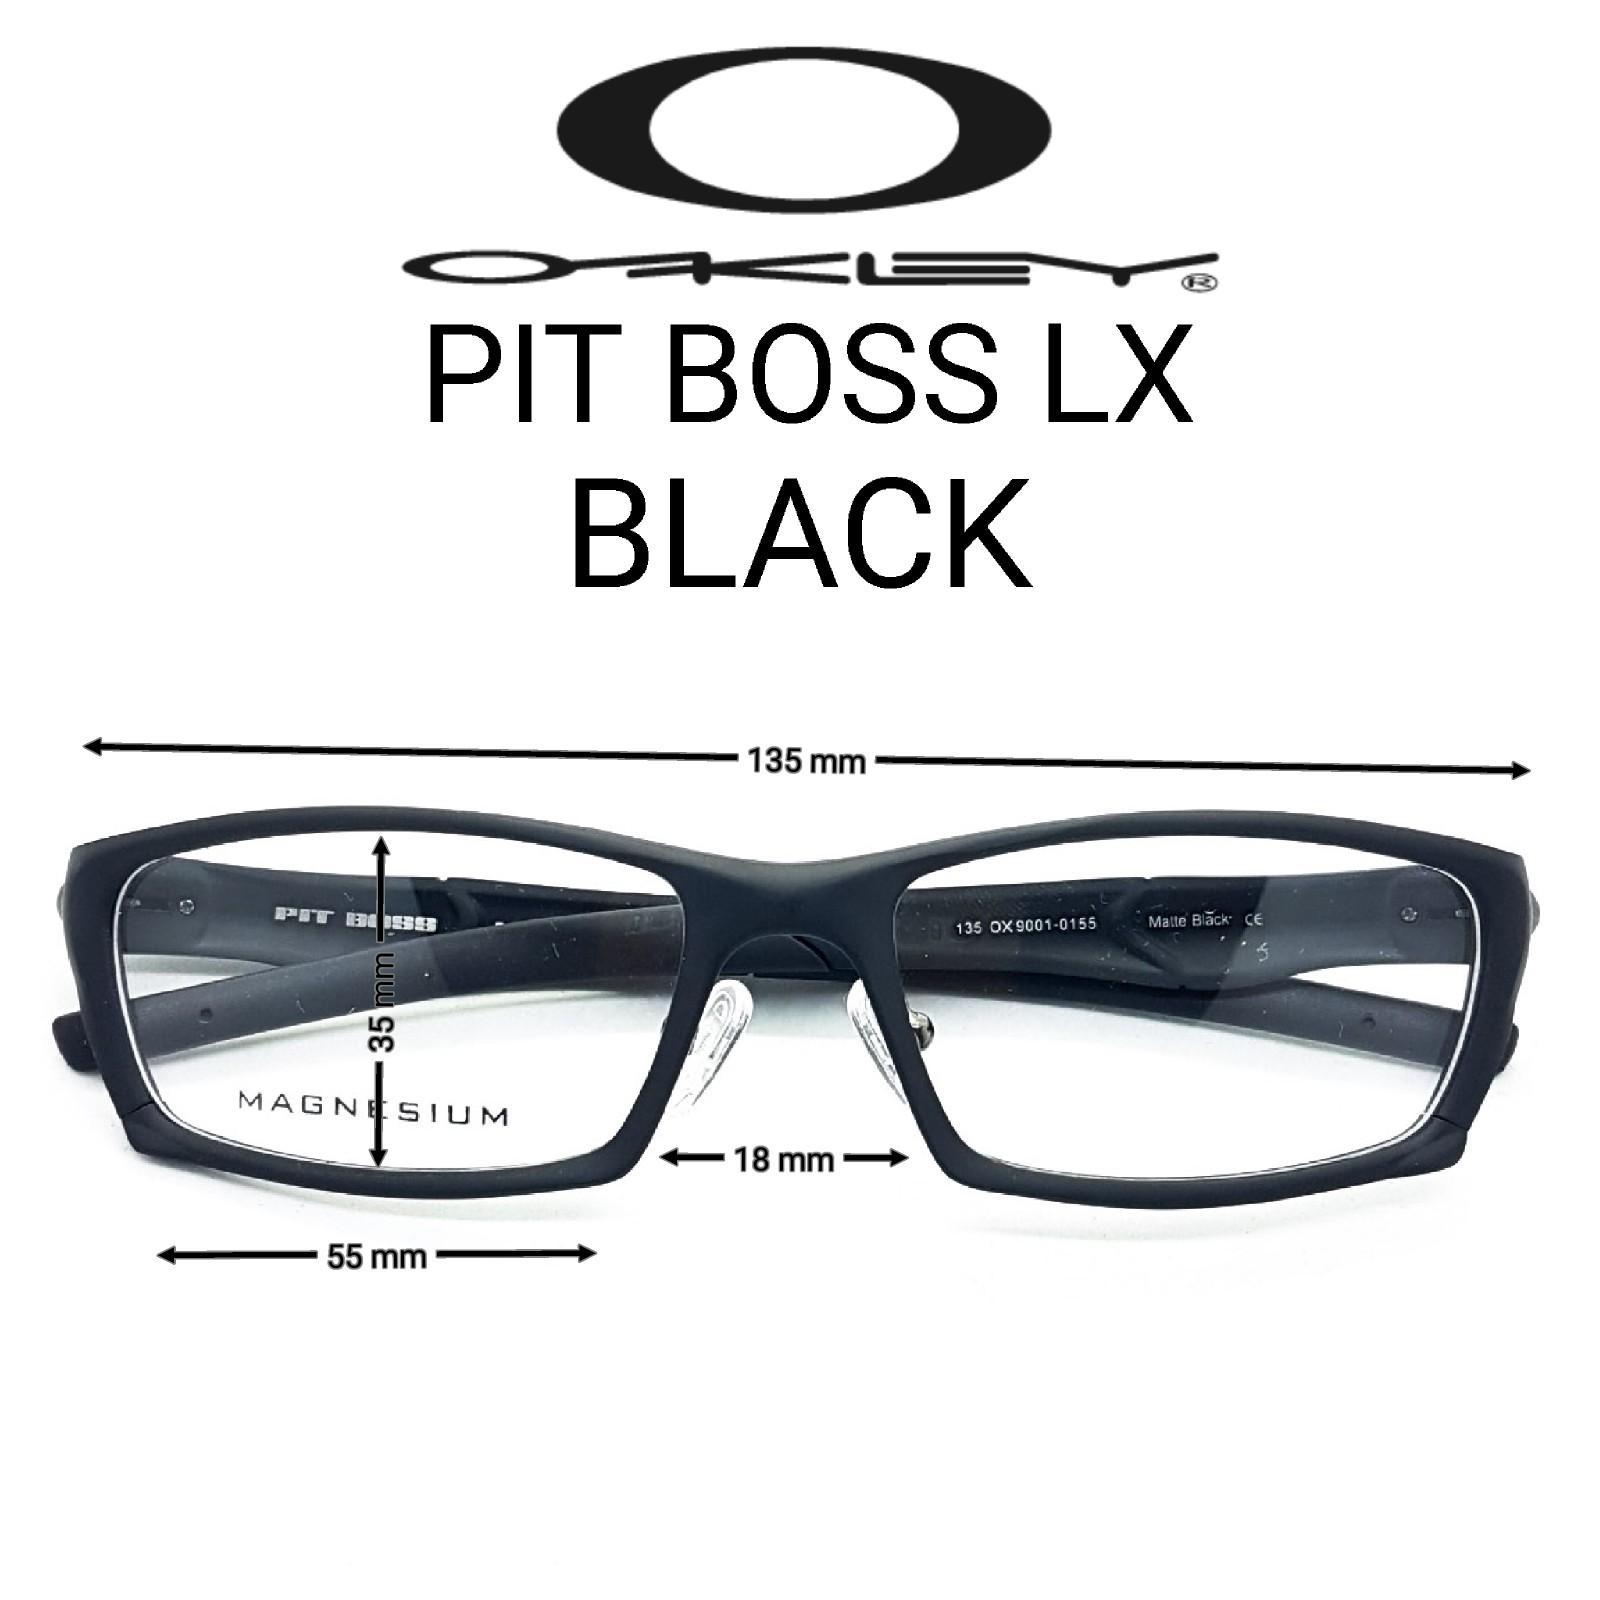 Pit Boss Eyeglasses -Ferarri Edition